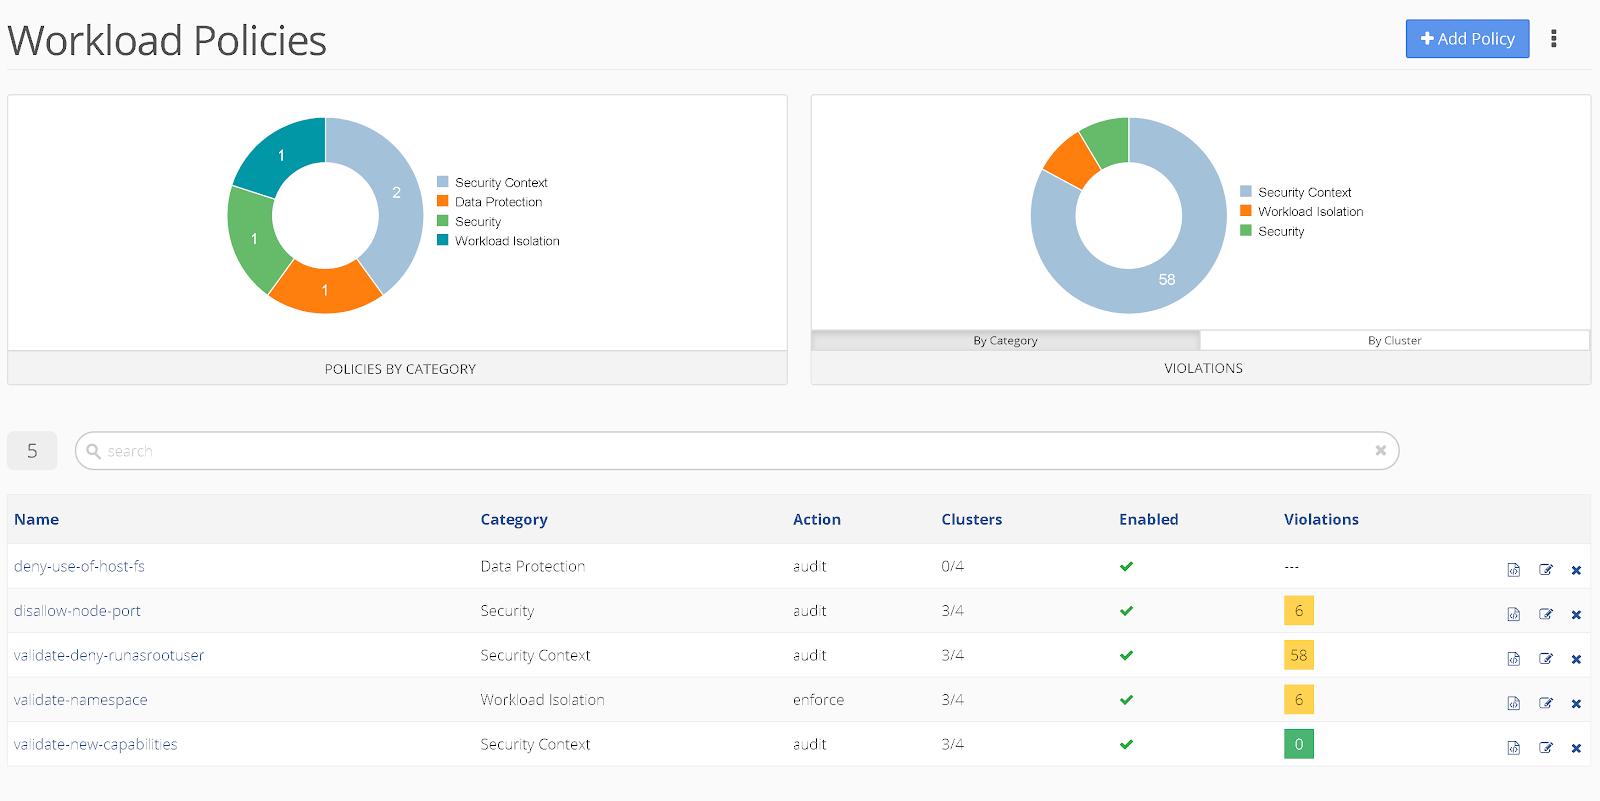 Kyverno workload policies screenshot